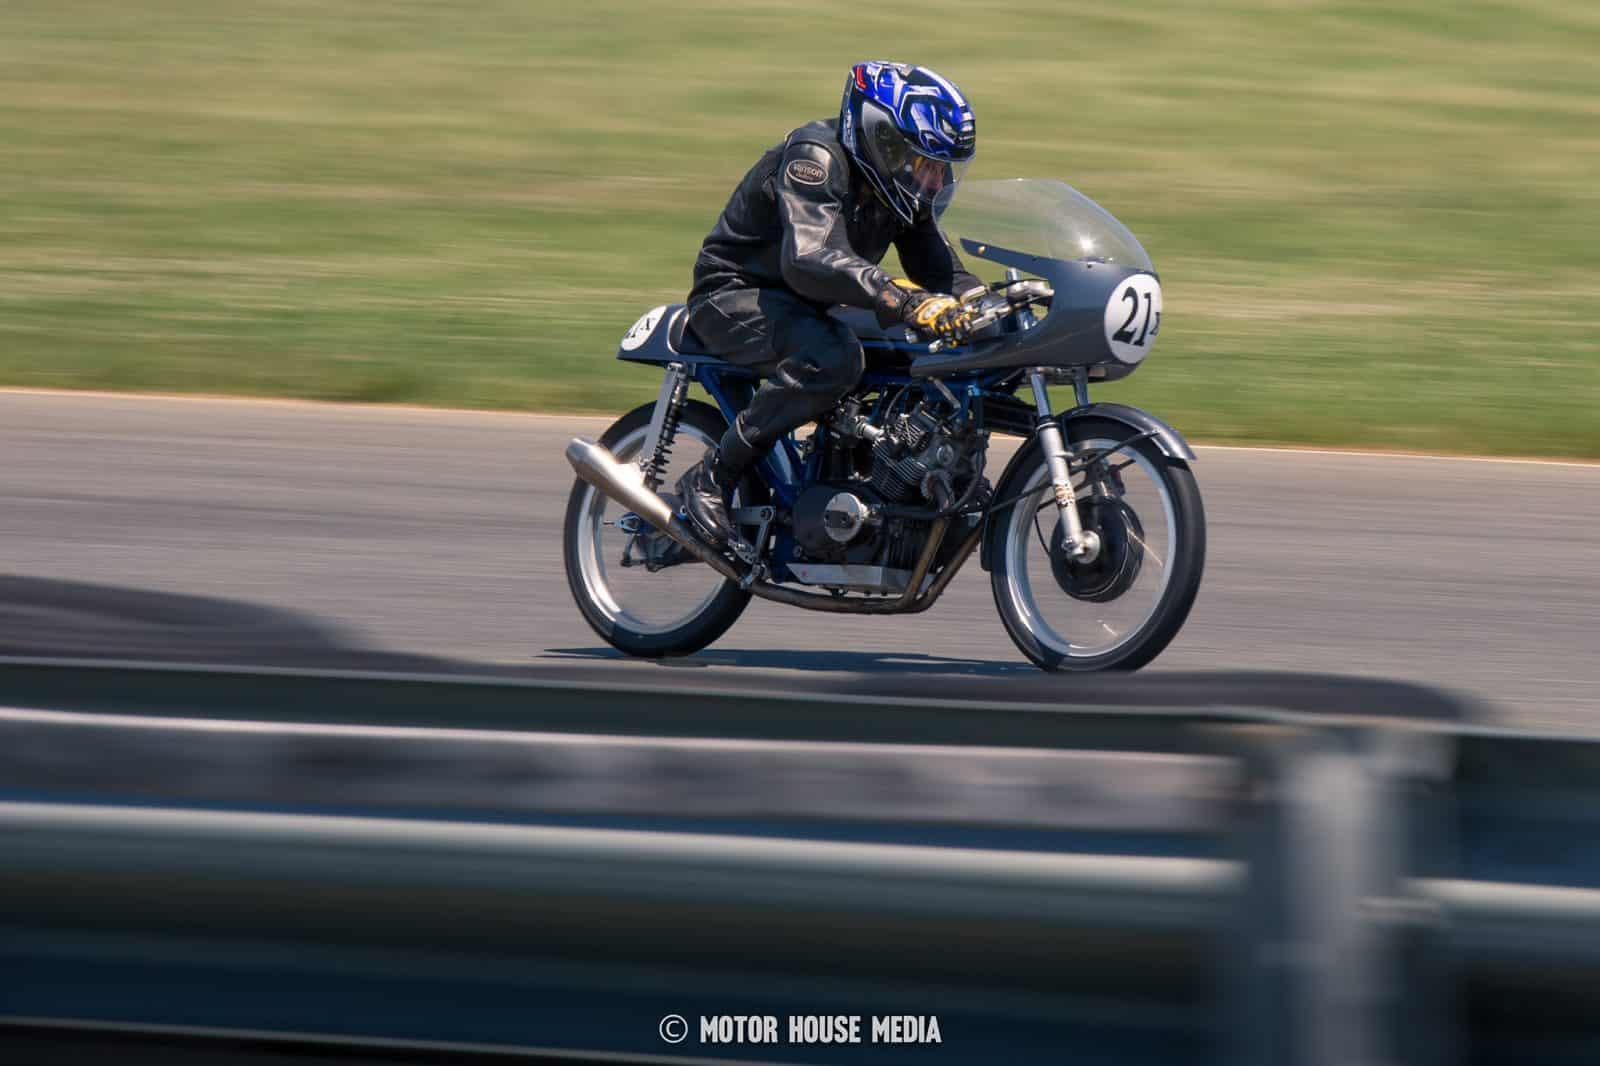 AHMRA vintage bike racer